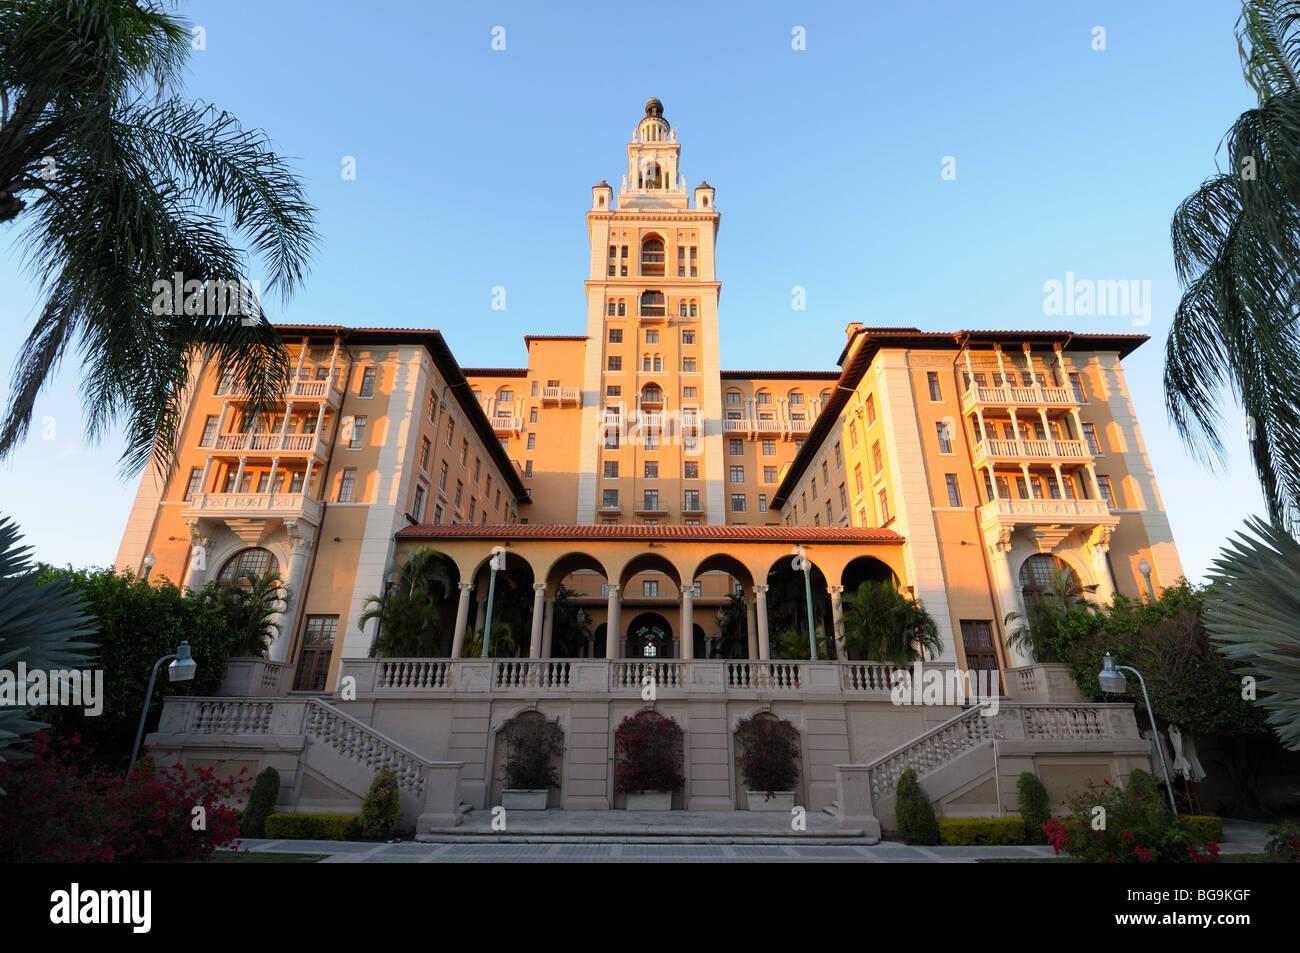 The historic Biltmore Hotel in Coral Gables, Miami Florida - Stock Image